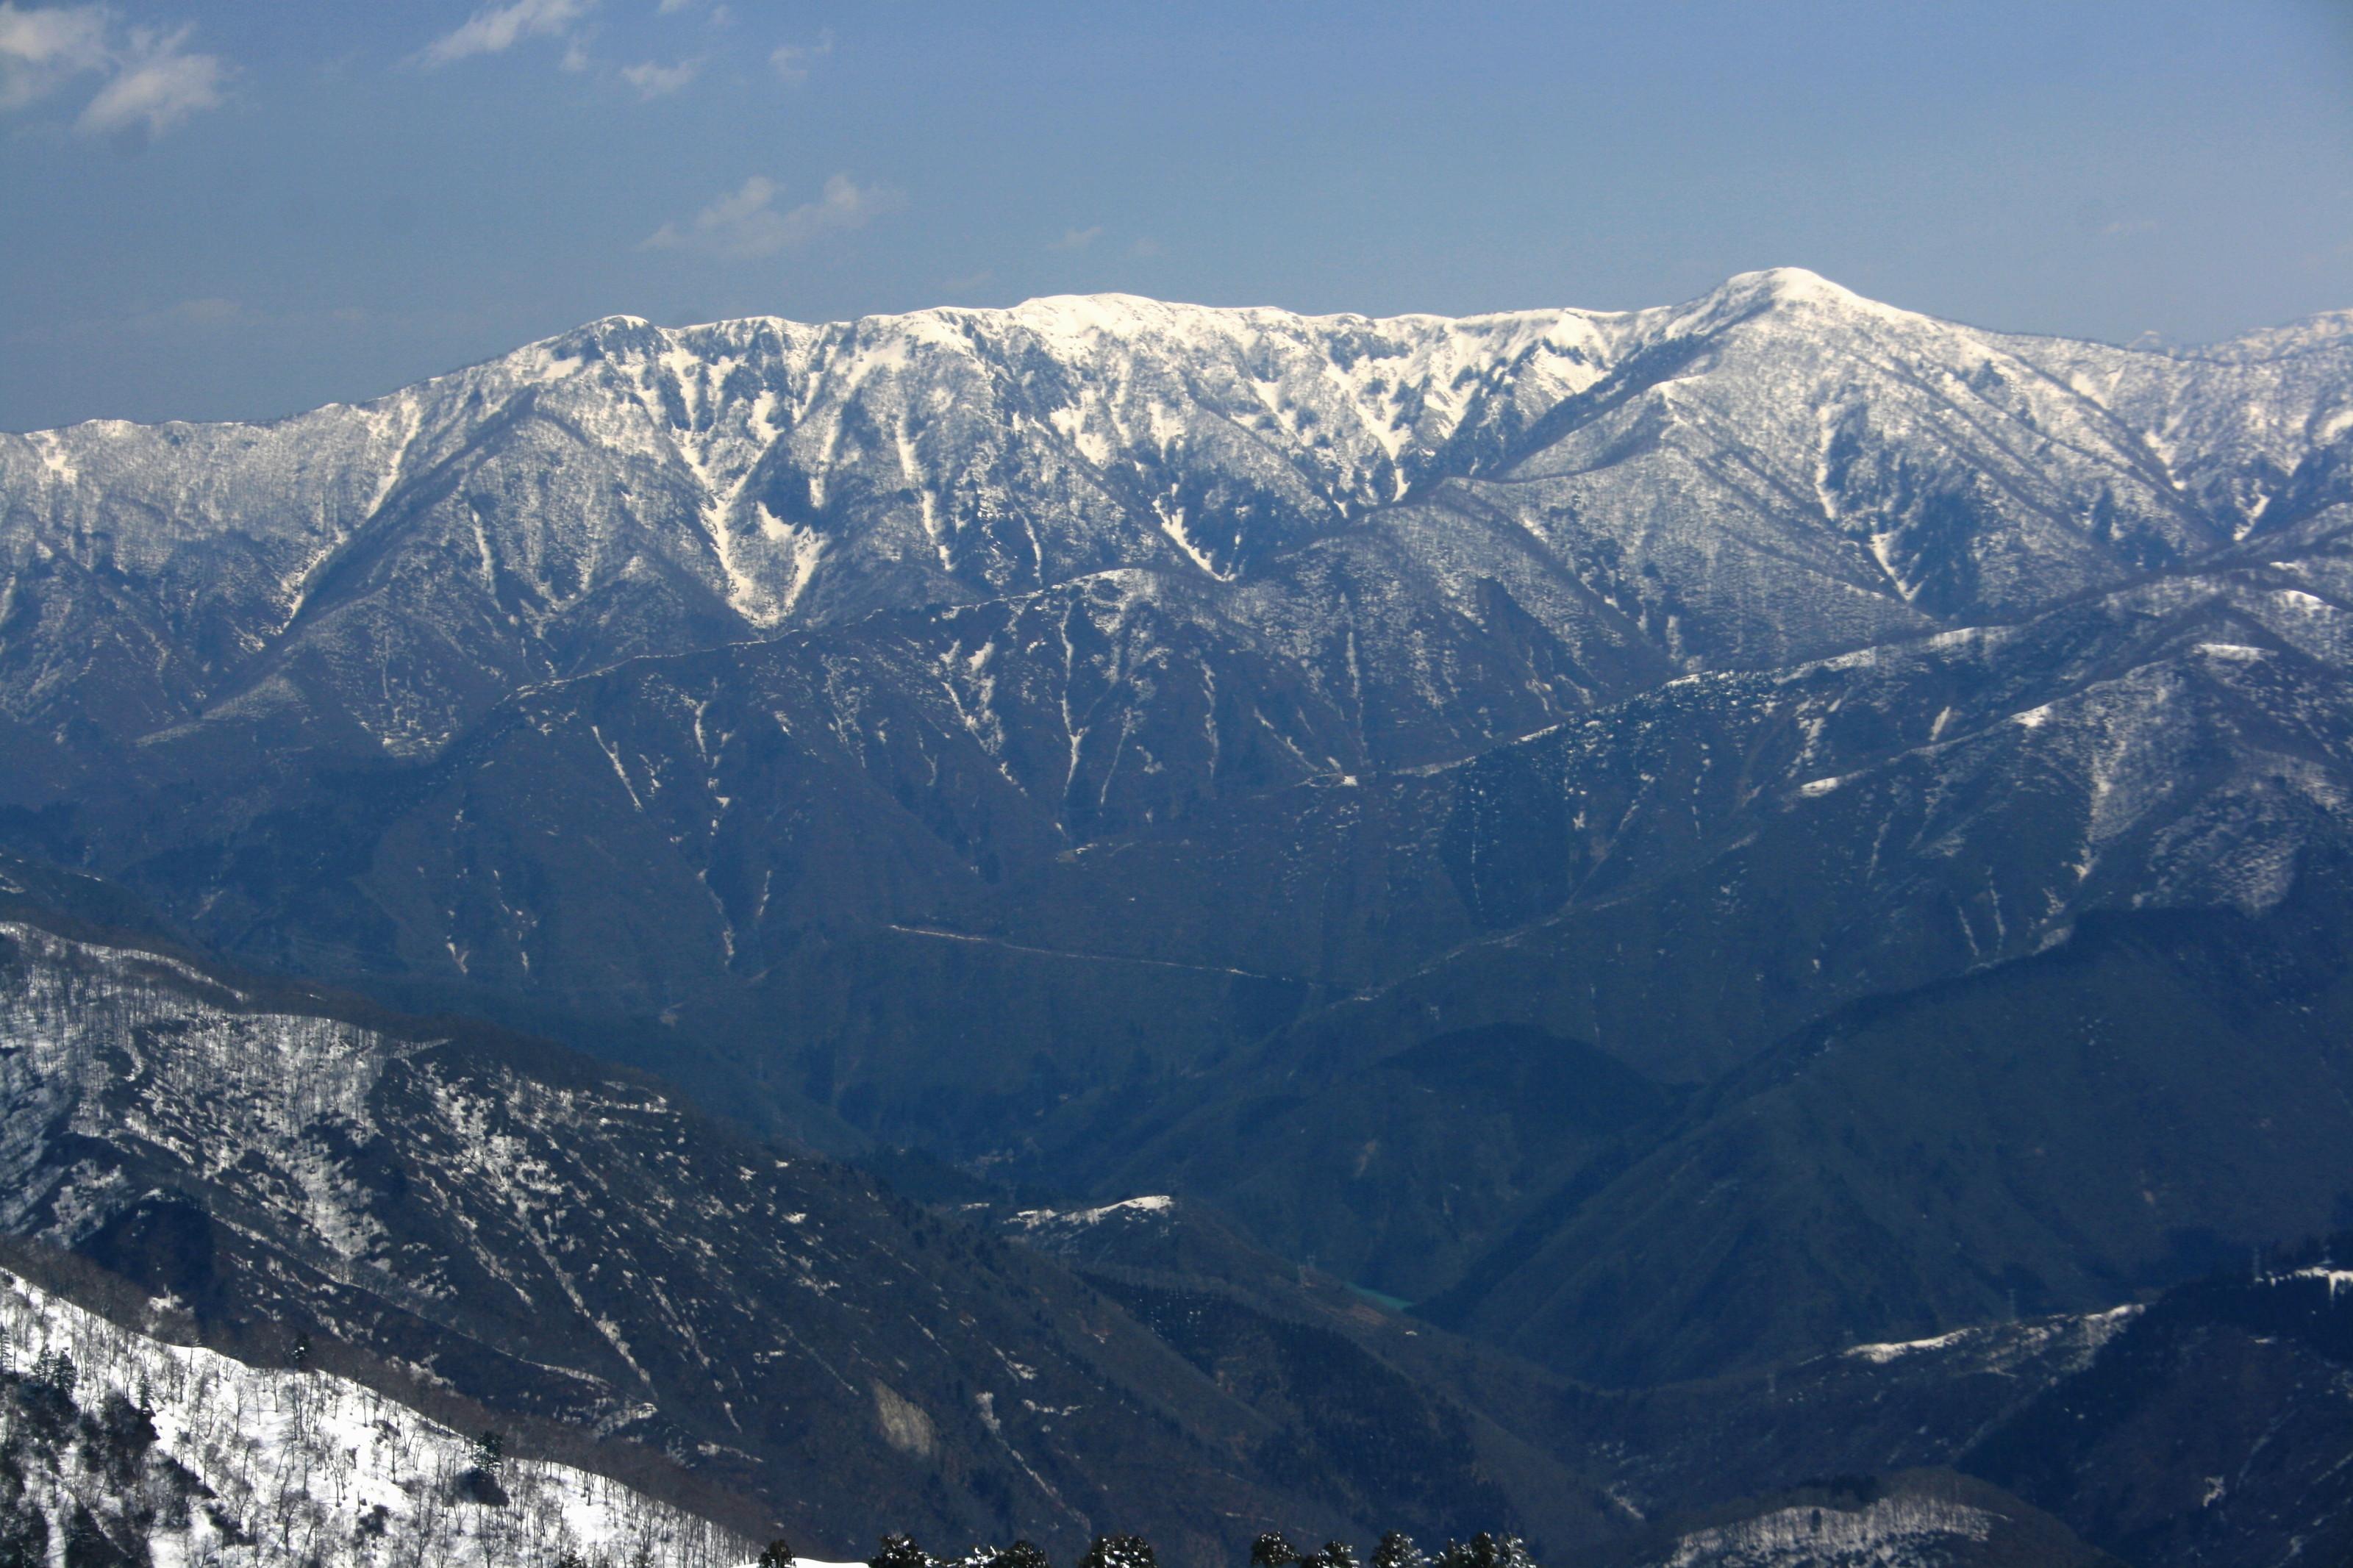 Ningyo mountain photo